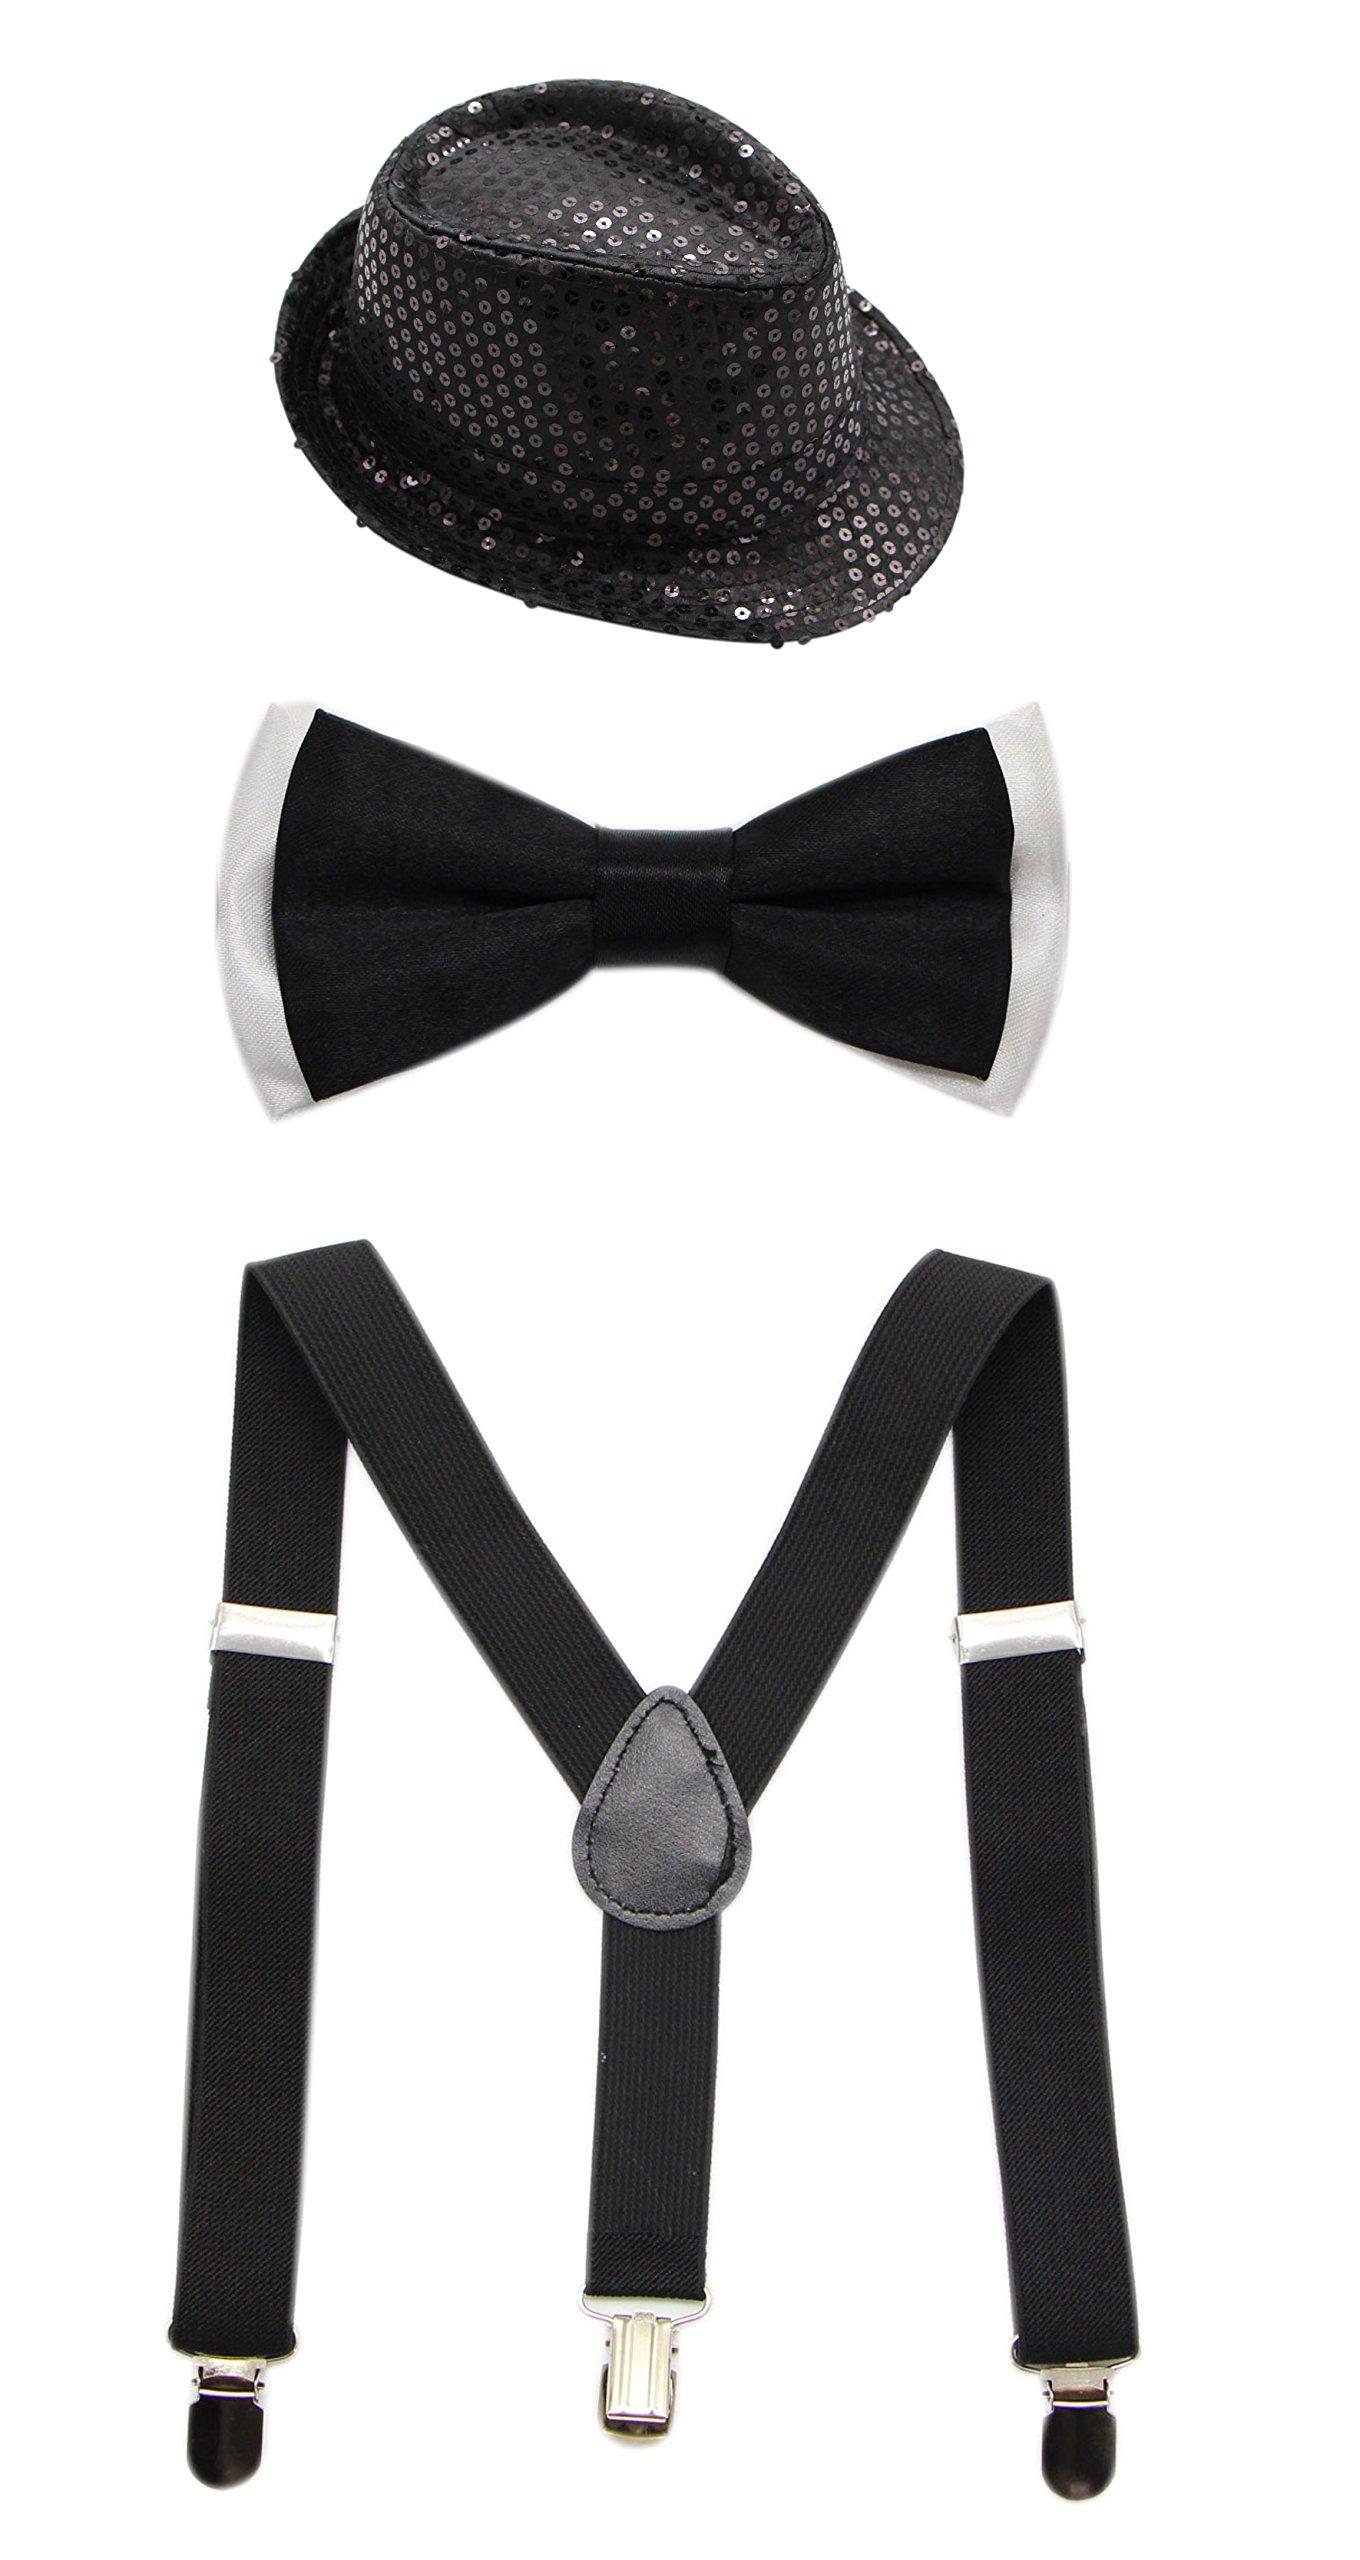 JAIFEI Boys Adjustable Suspenders With Pre-Tied Bow Tie & Paillette Fedora Hat (Black)